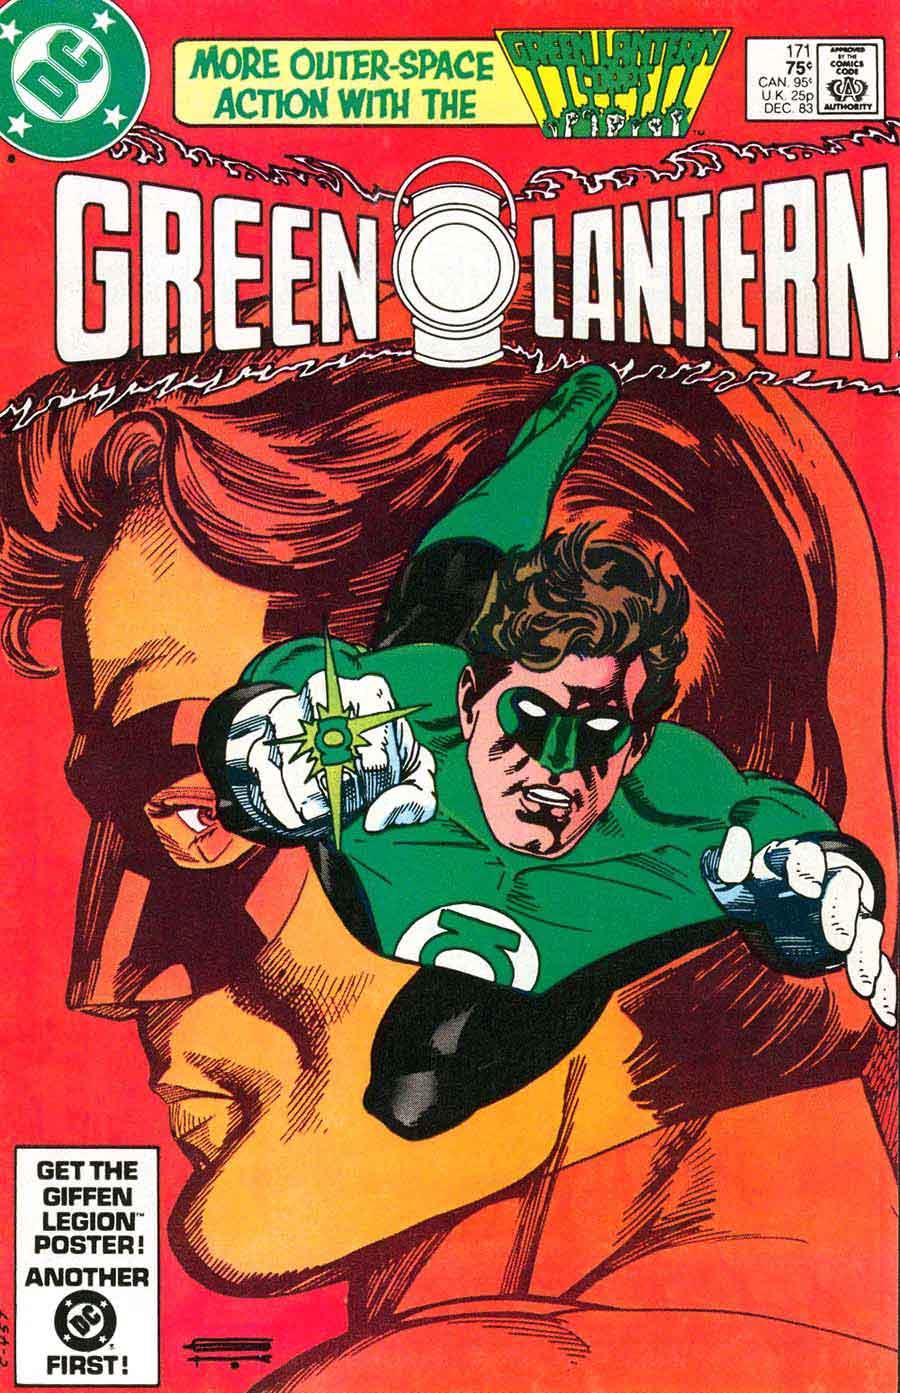 Green Lantern v2 #171 dc comic book cover art by Gil Kane